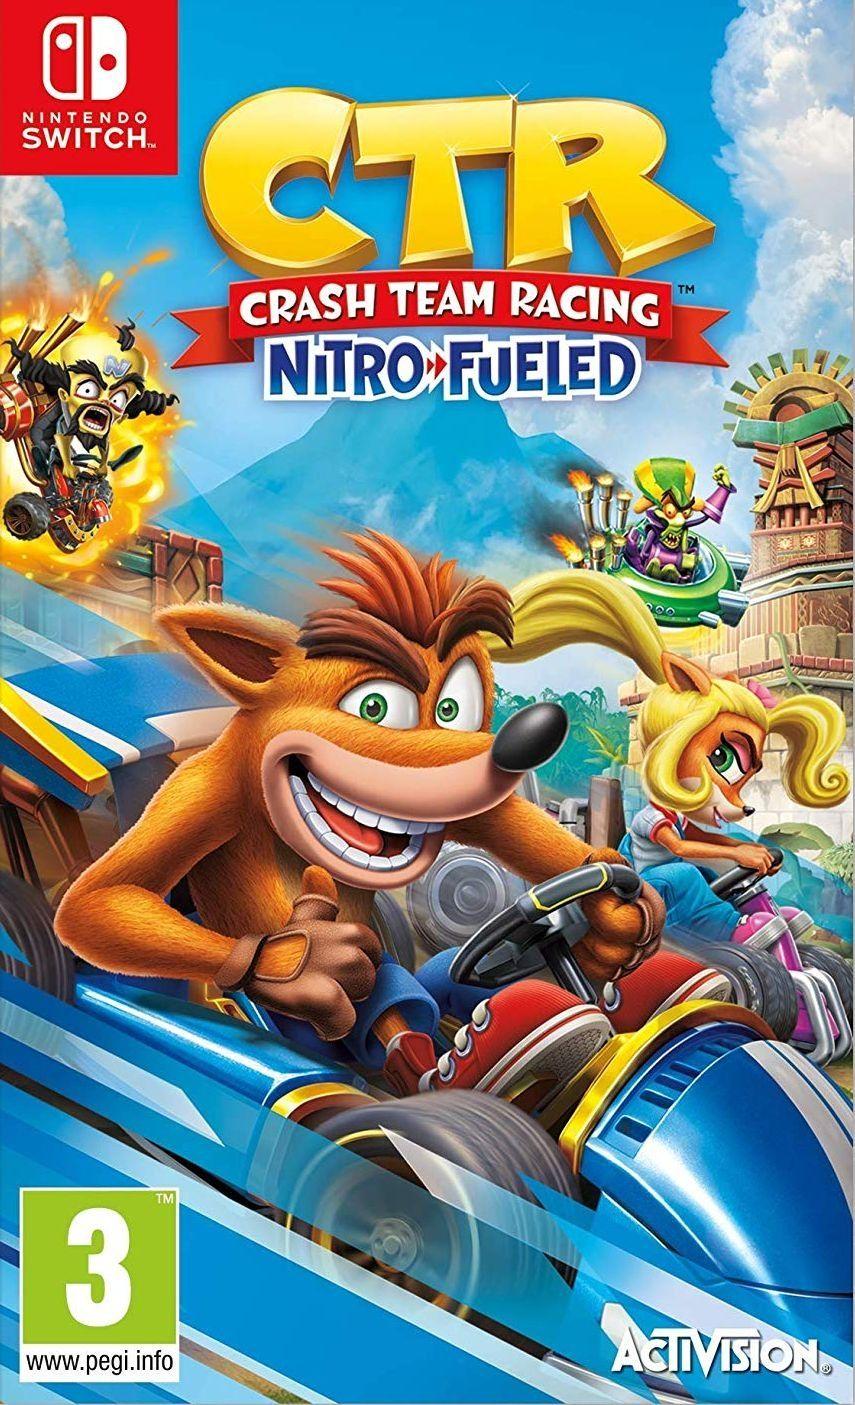 Crash Team Racing Nitro-Fueled (Nintendo Switch) - 1